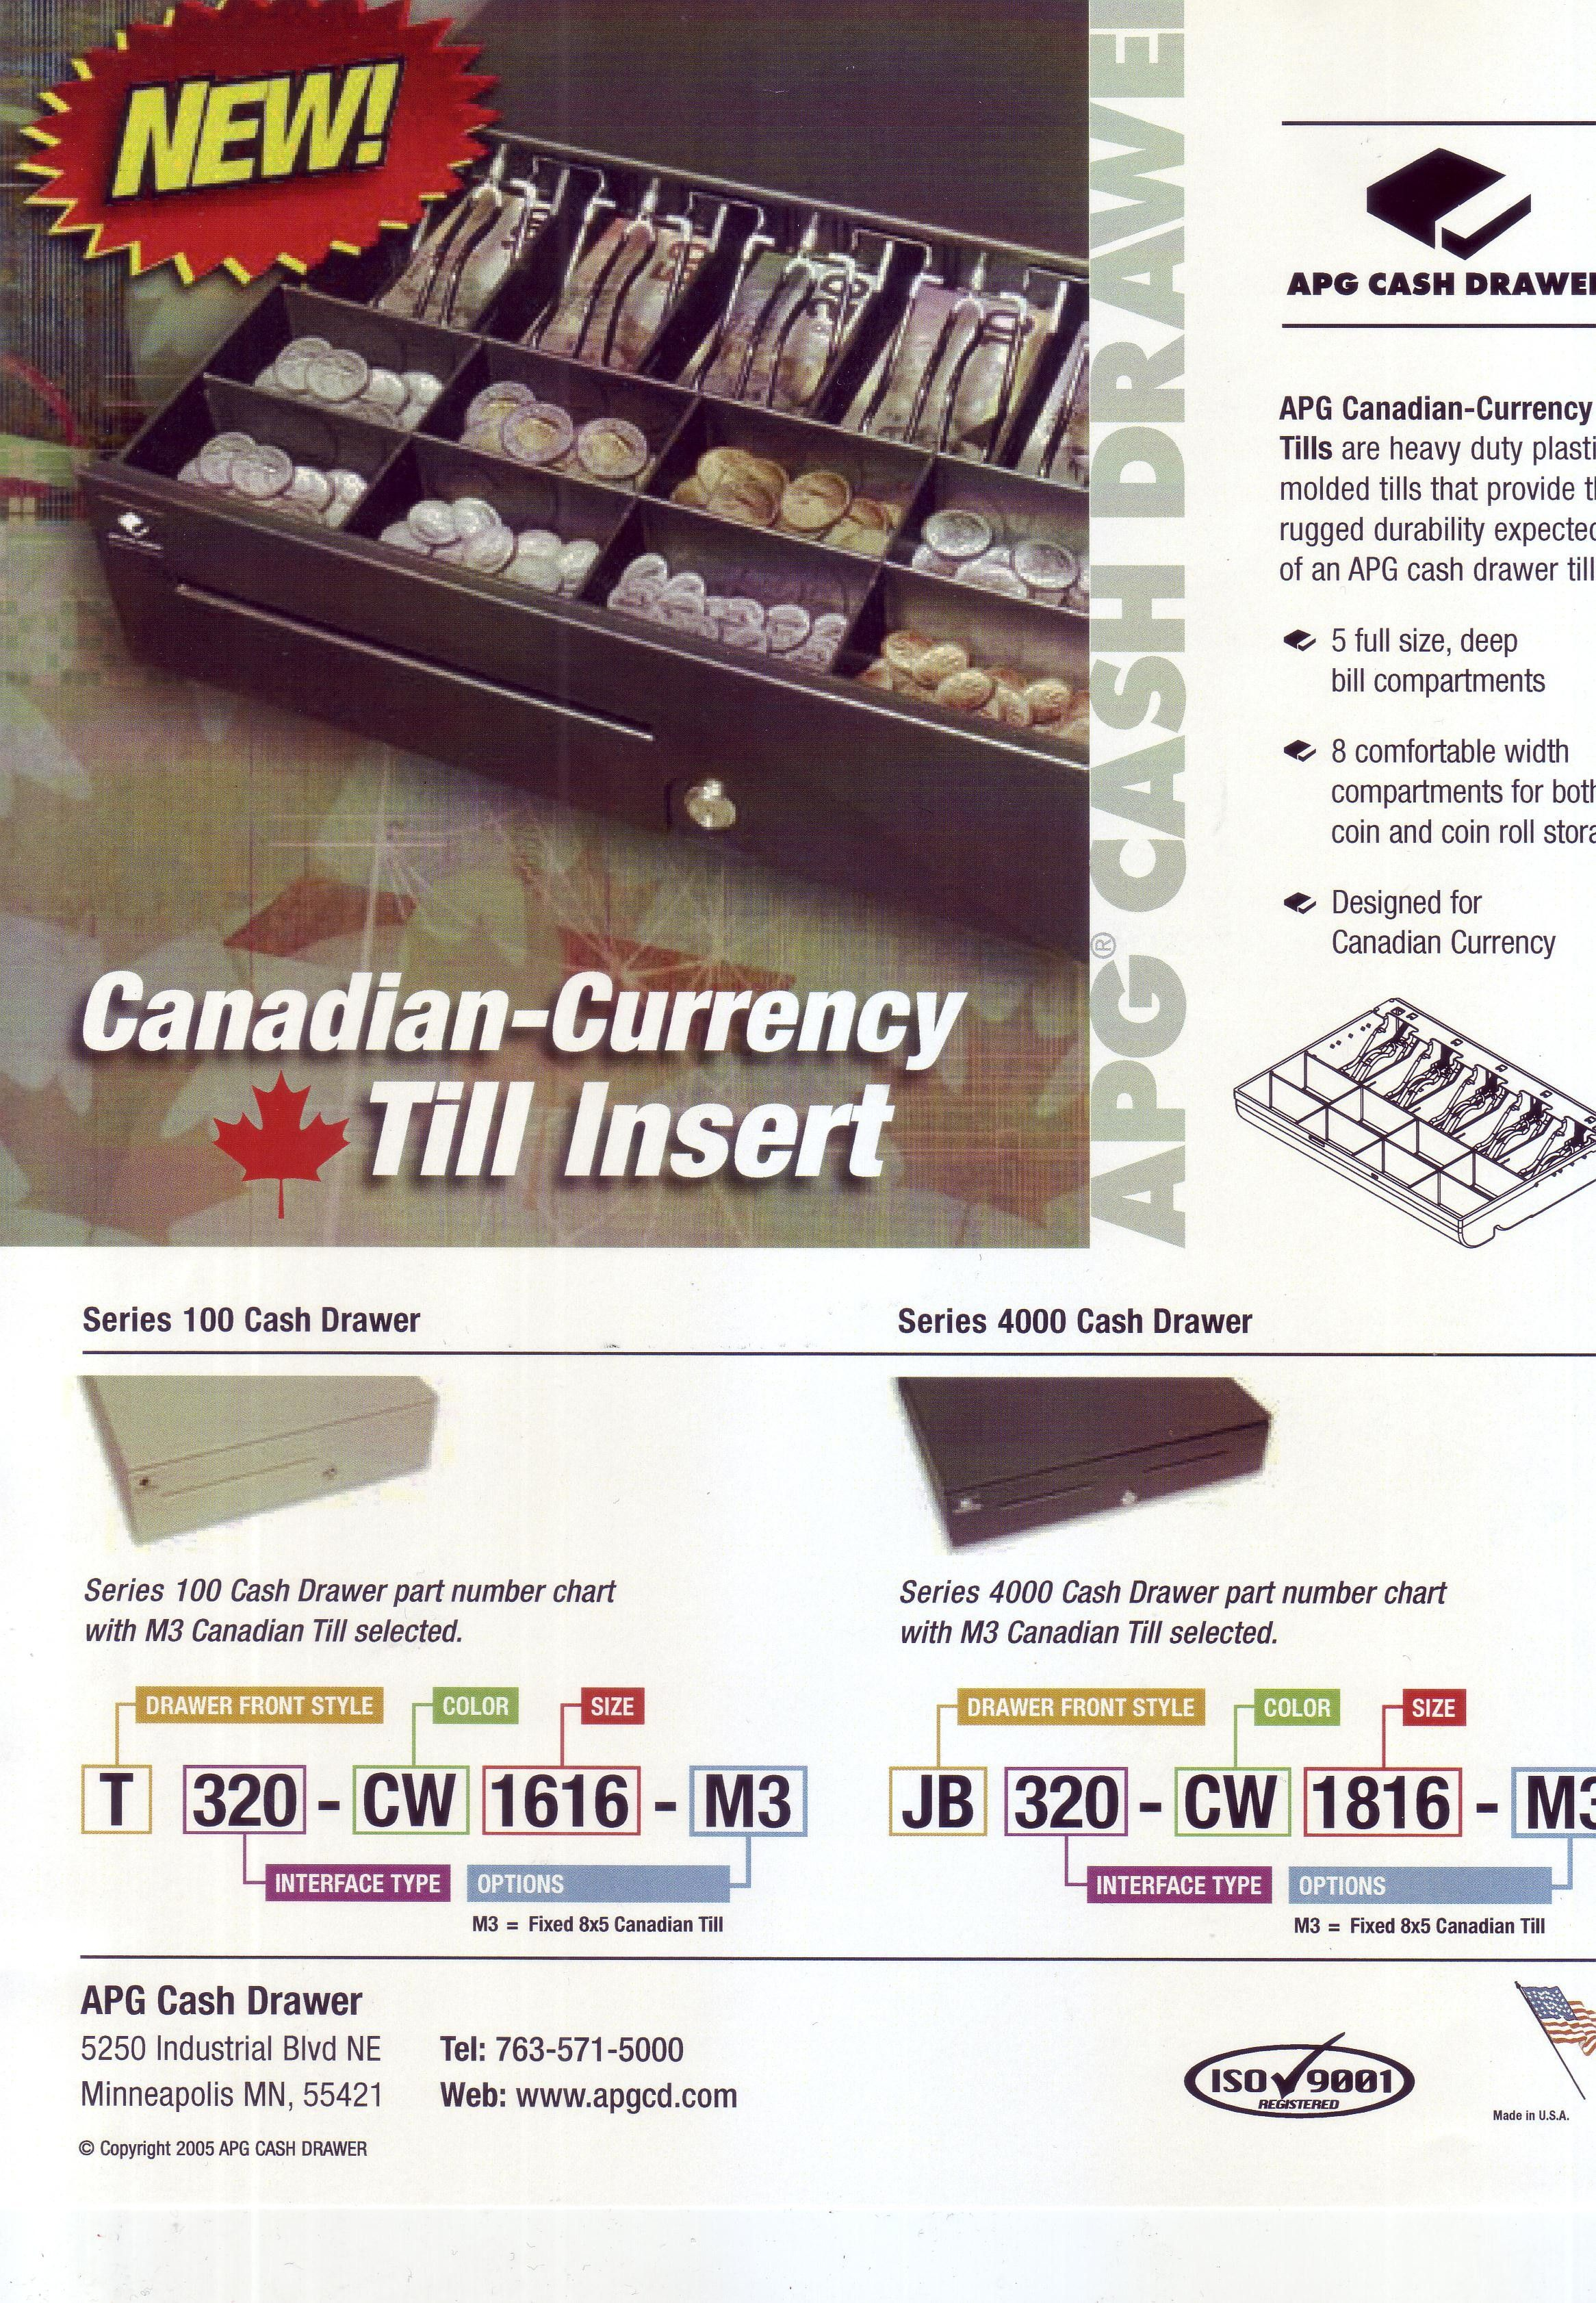 p cash apg image product msr hp mini drawer price uk